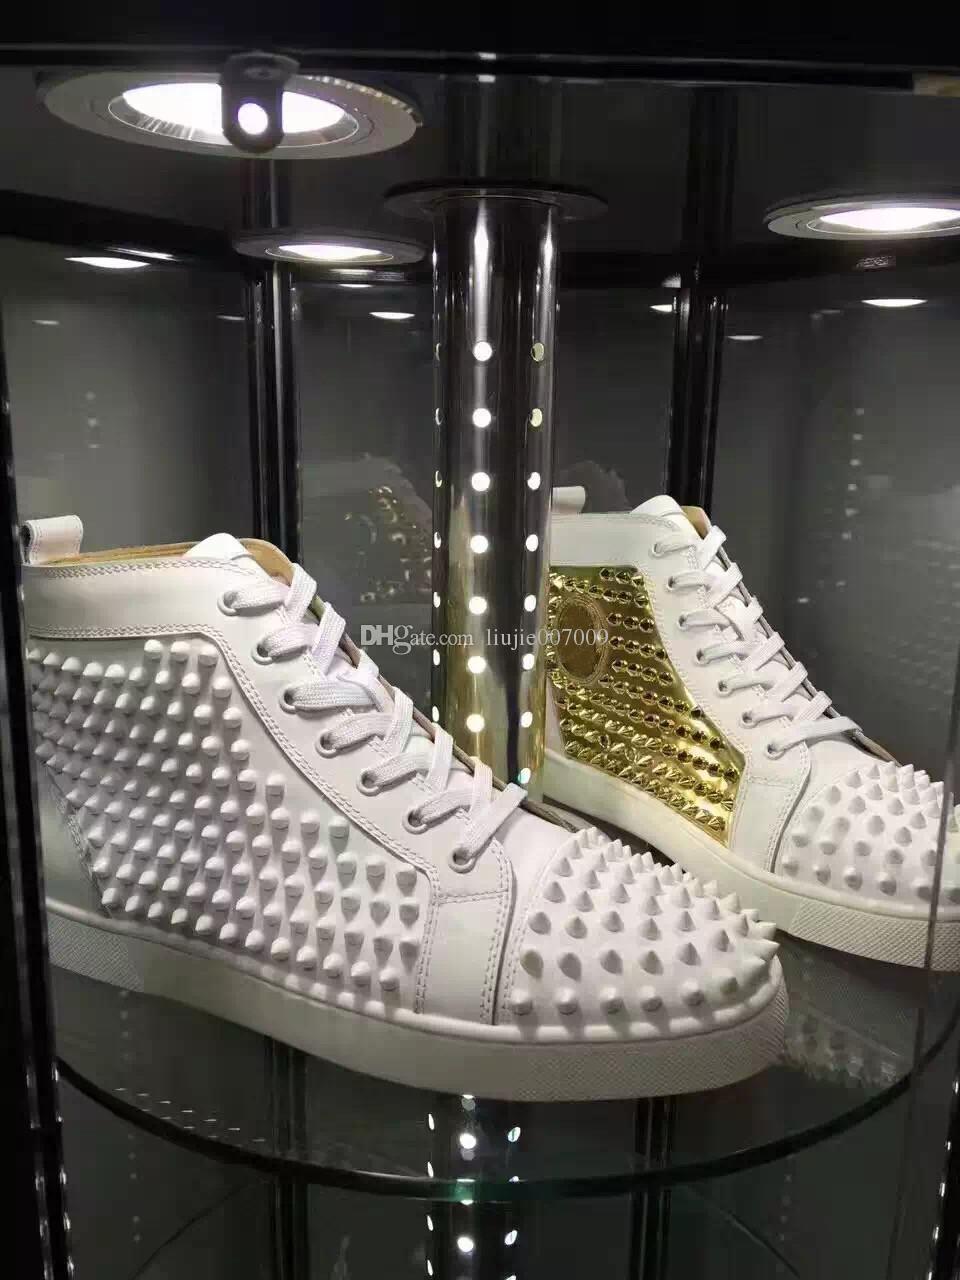 Nombre de la marca de alta calidad Casual Shoe Man Woman Red Bottom Sneaker Fashion Patchwork Oro brillante High Top Rivets Lace Up Party Shoes Spikes